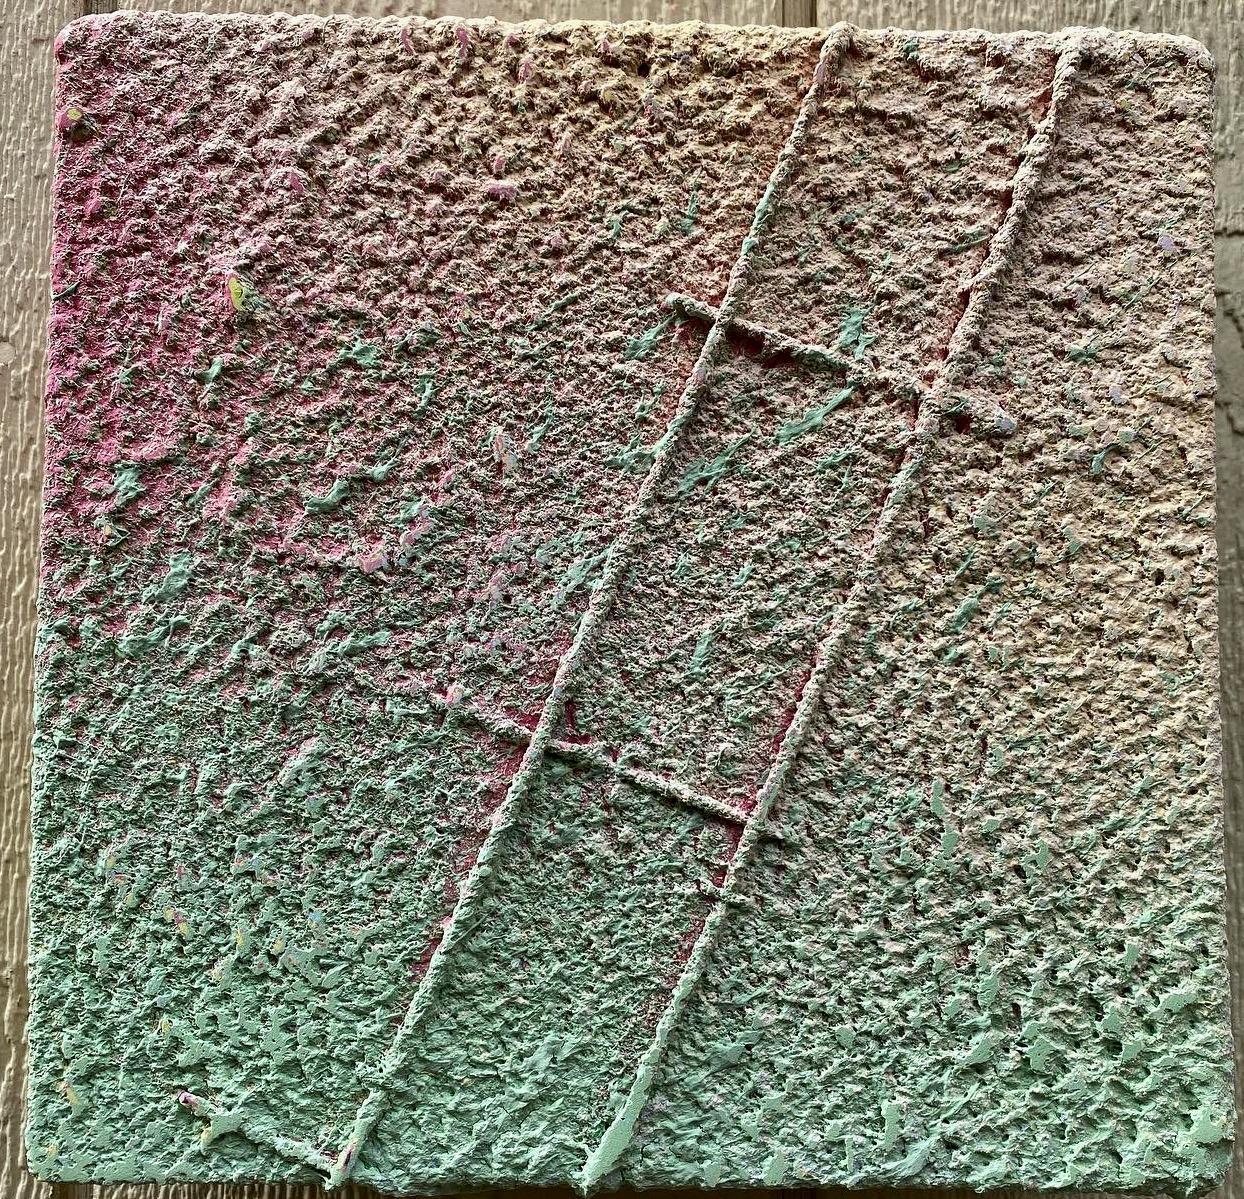 Pastel 10by10z 4, mixed media by Joel Blenz